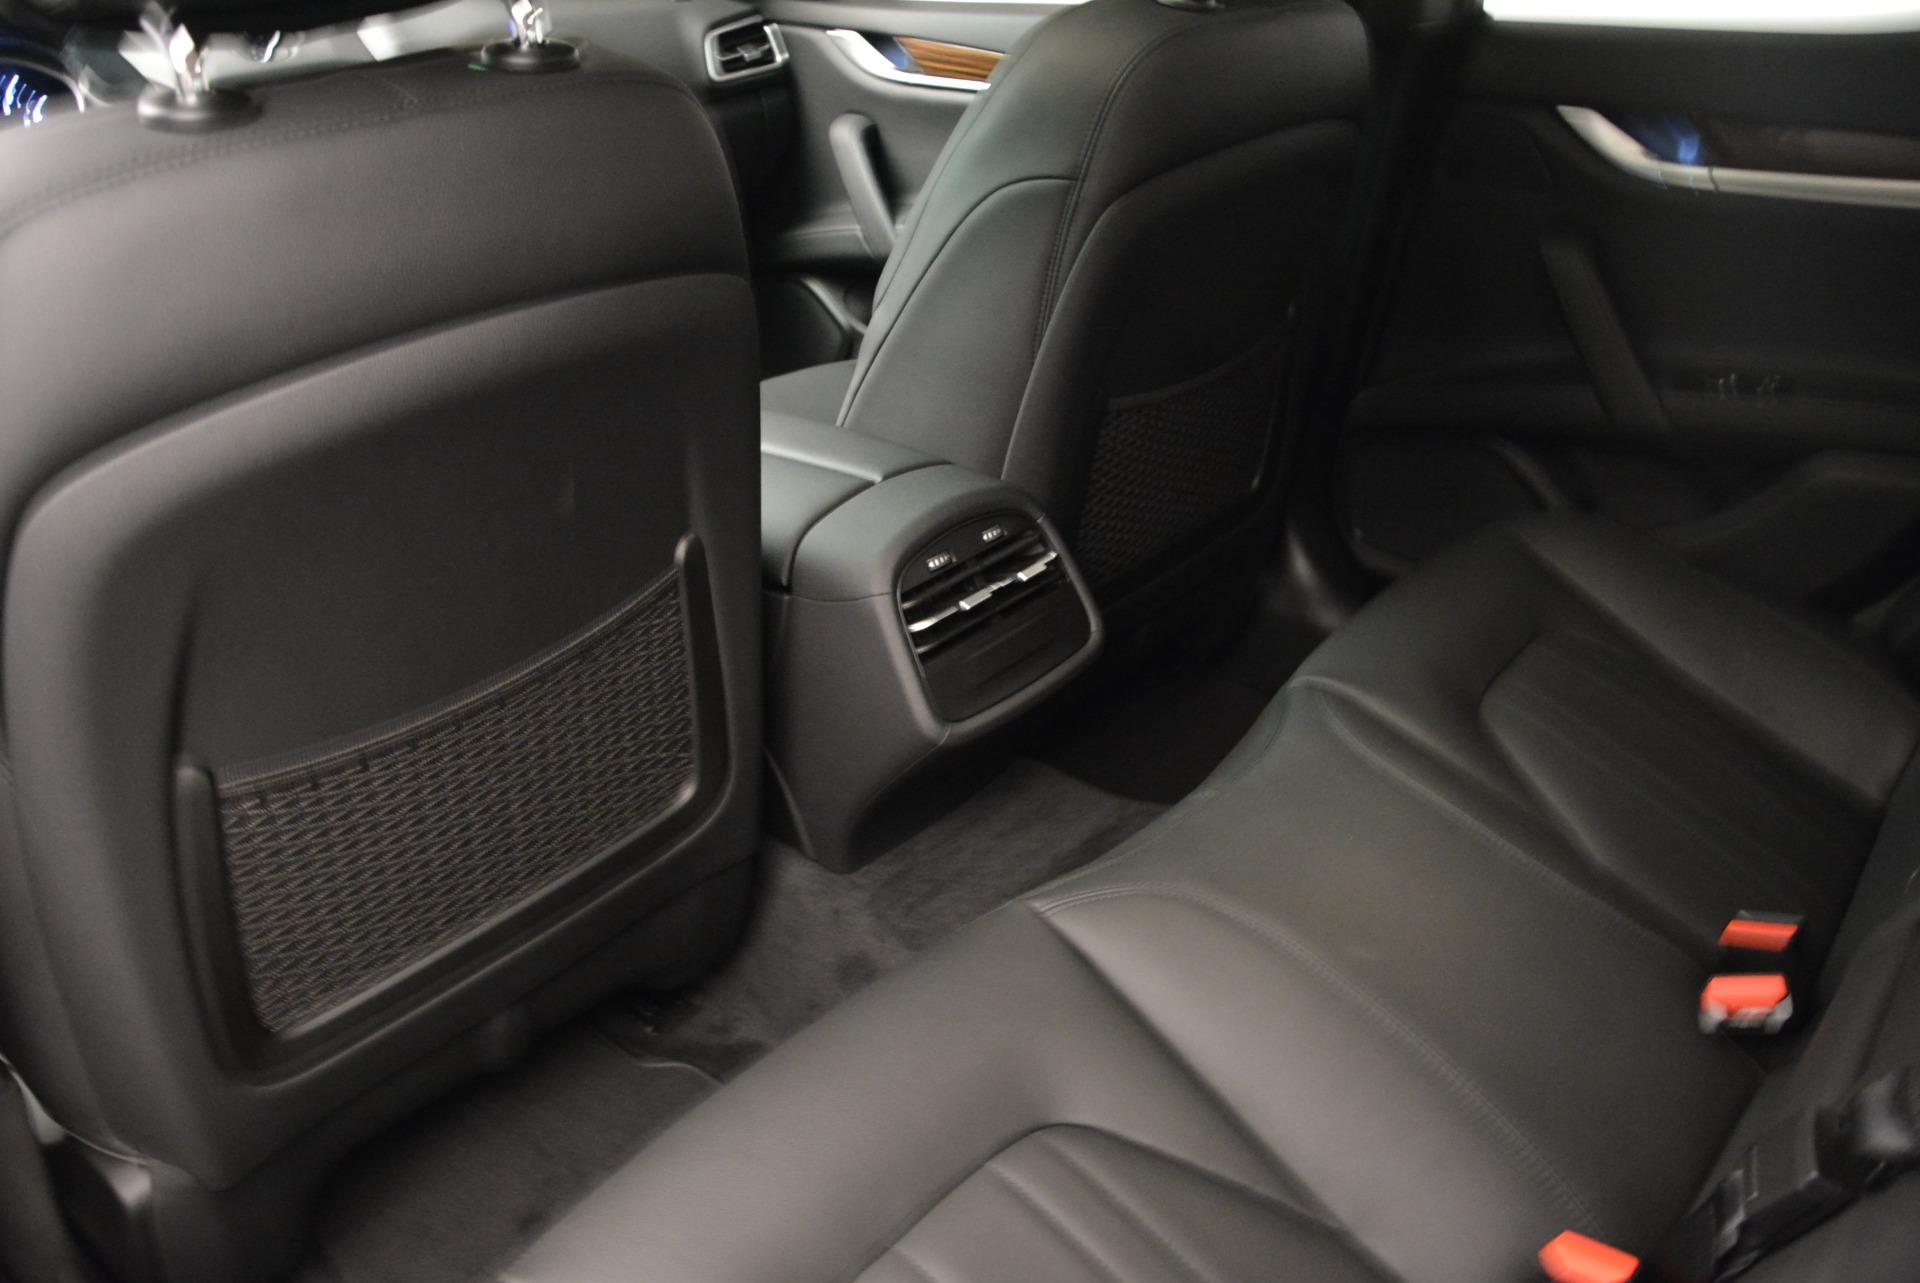 Used 2014 Maserati Ghibli S Q4 For Sale In Westport, CT 2562_p17